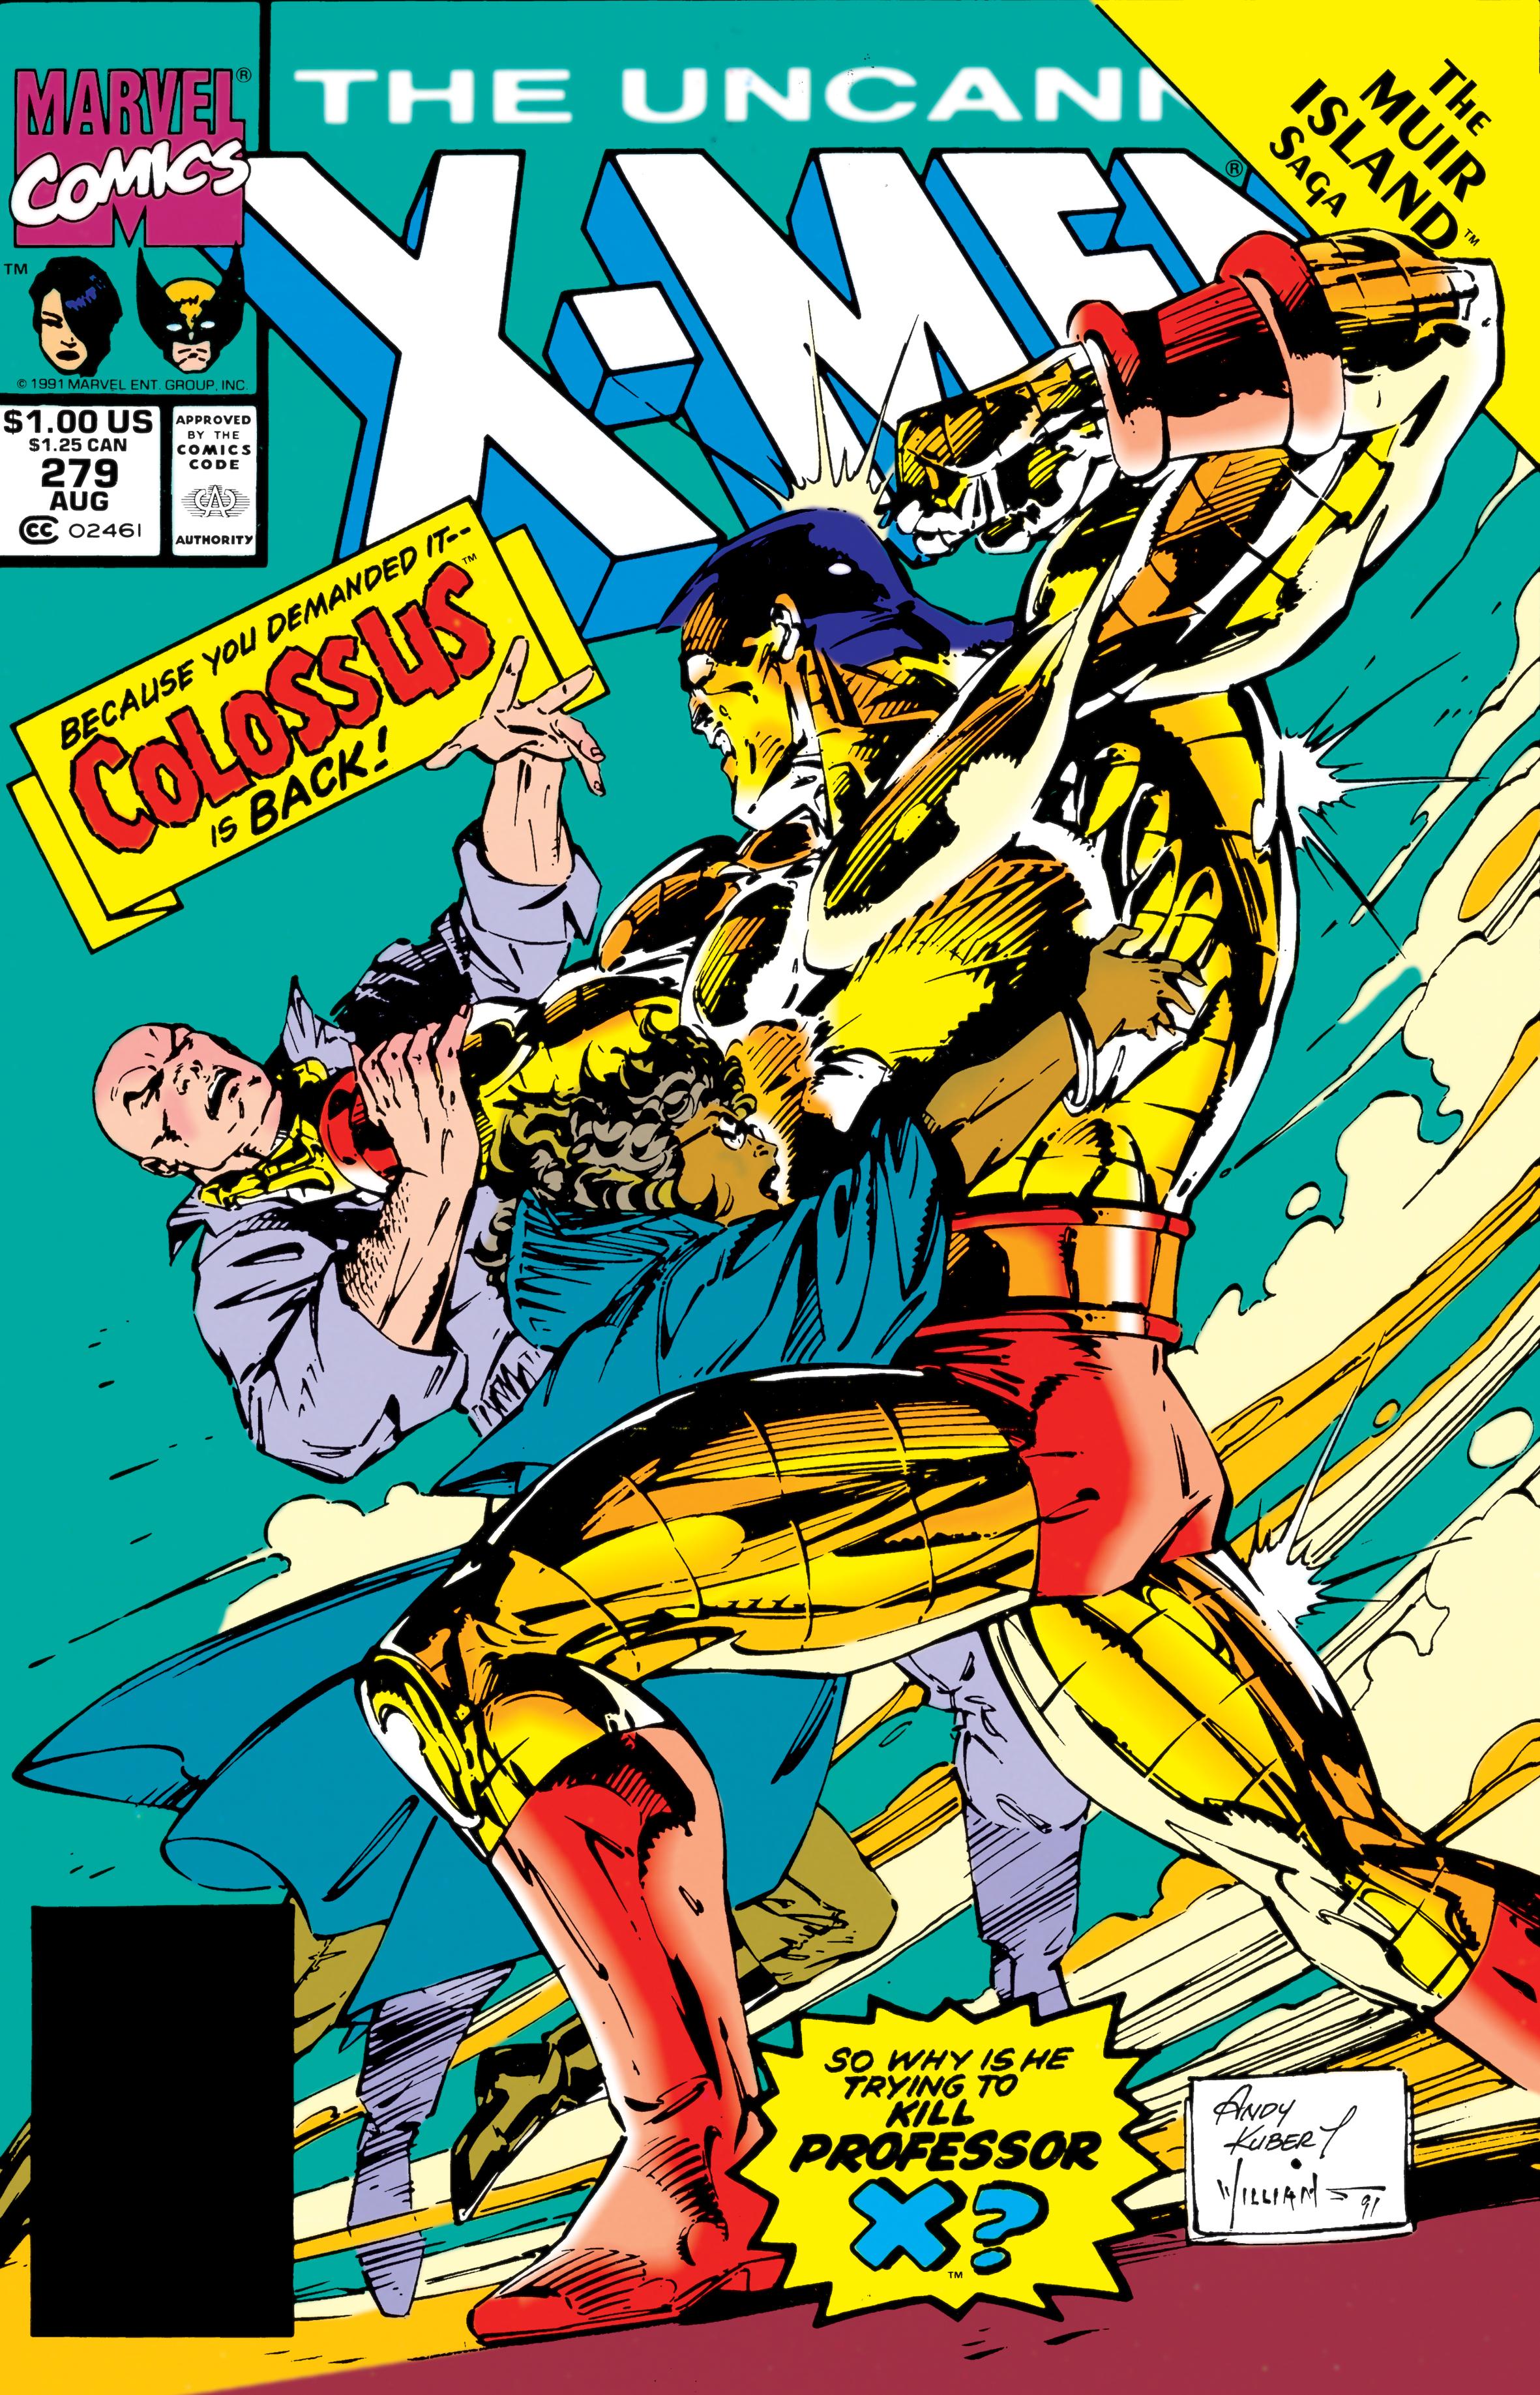 Uncanny X-Men (1963) #279